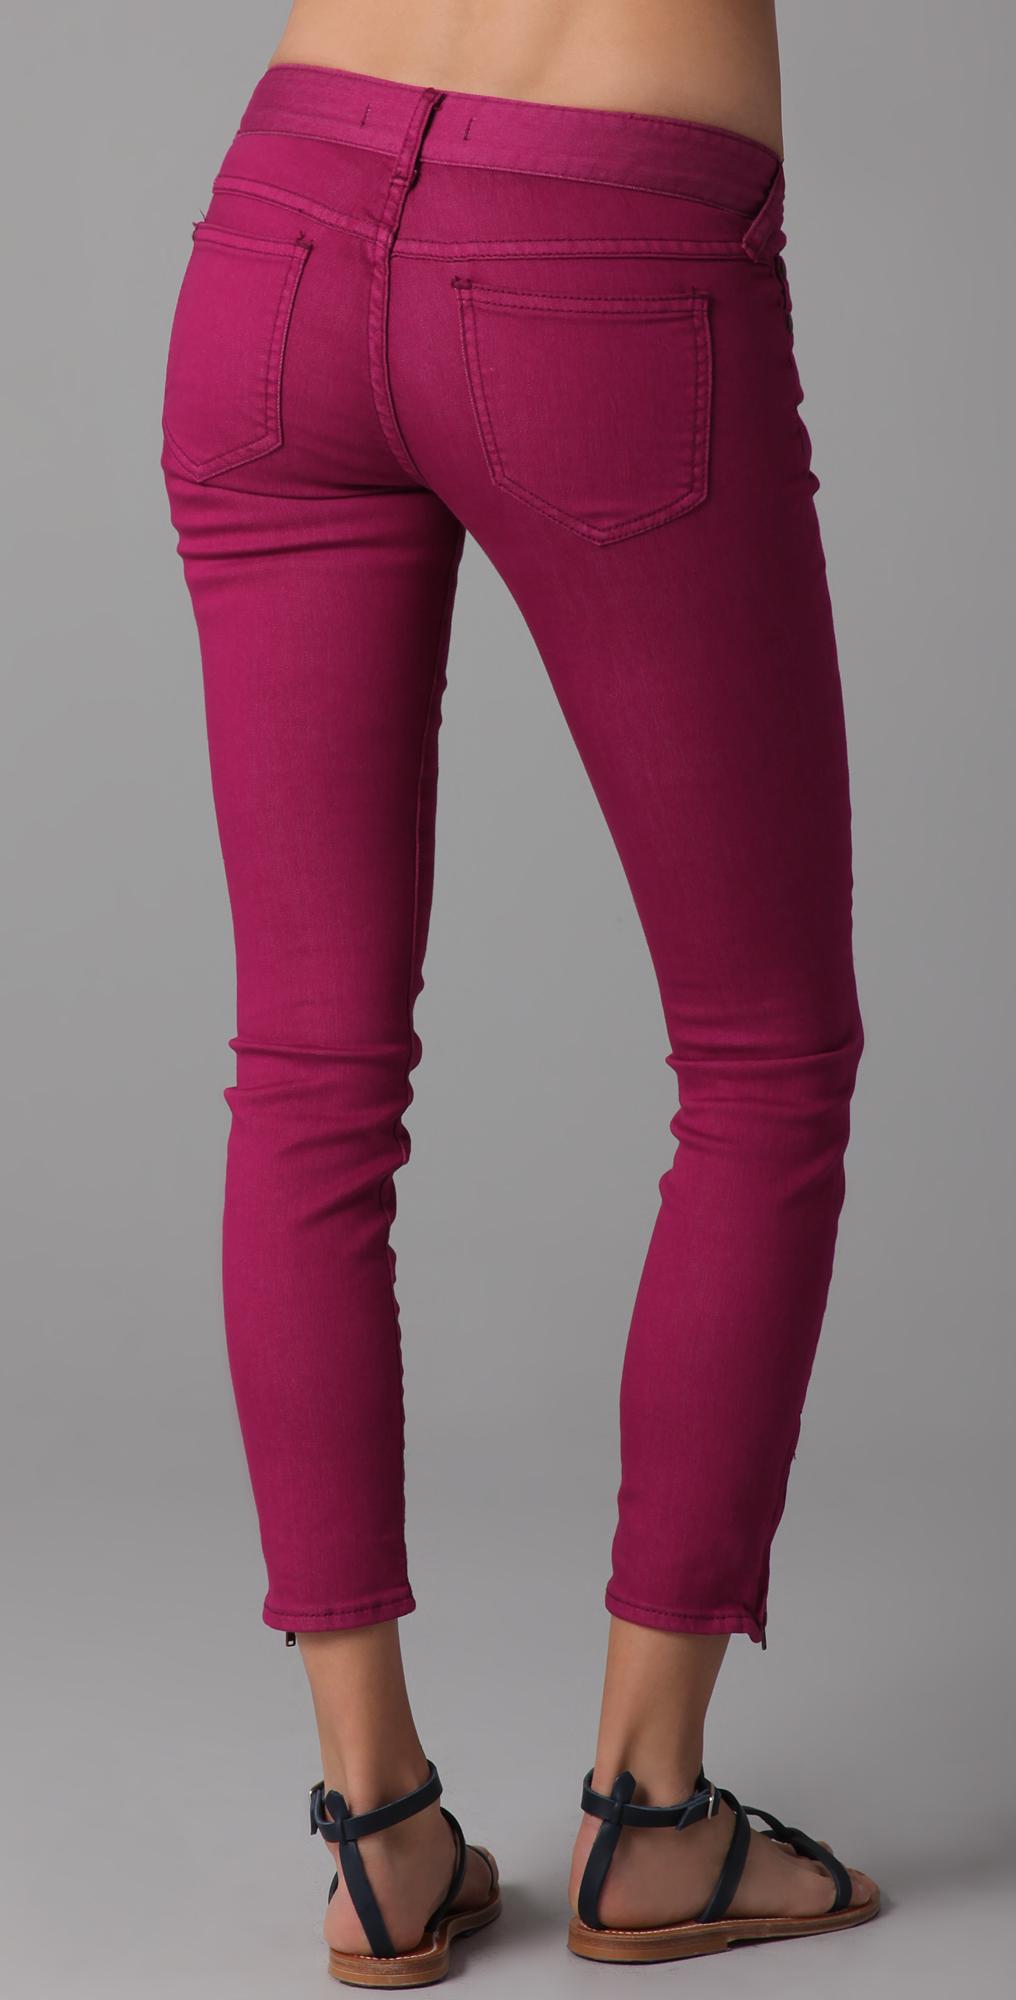 41a385786e0b8 Free People Ankle Zipper Skinny Jeans   SHOPBOP